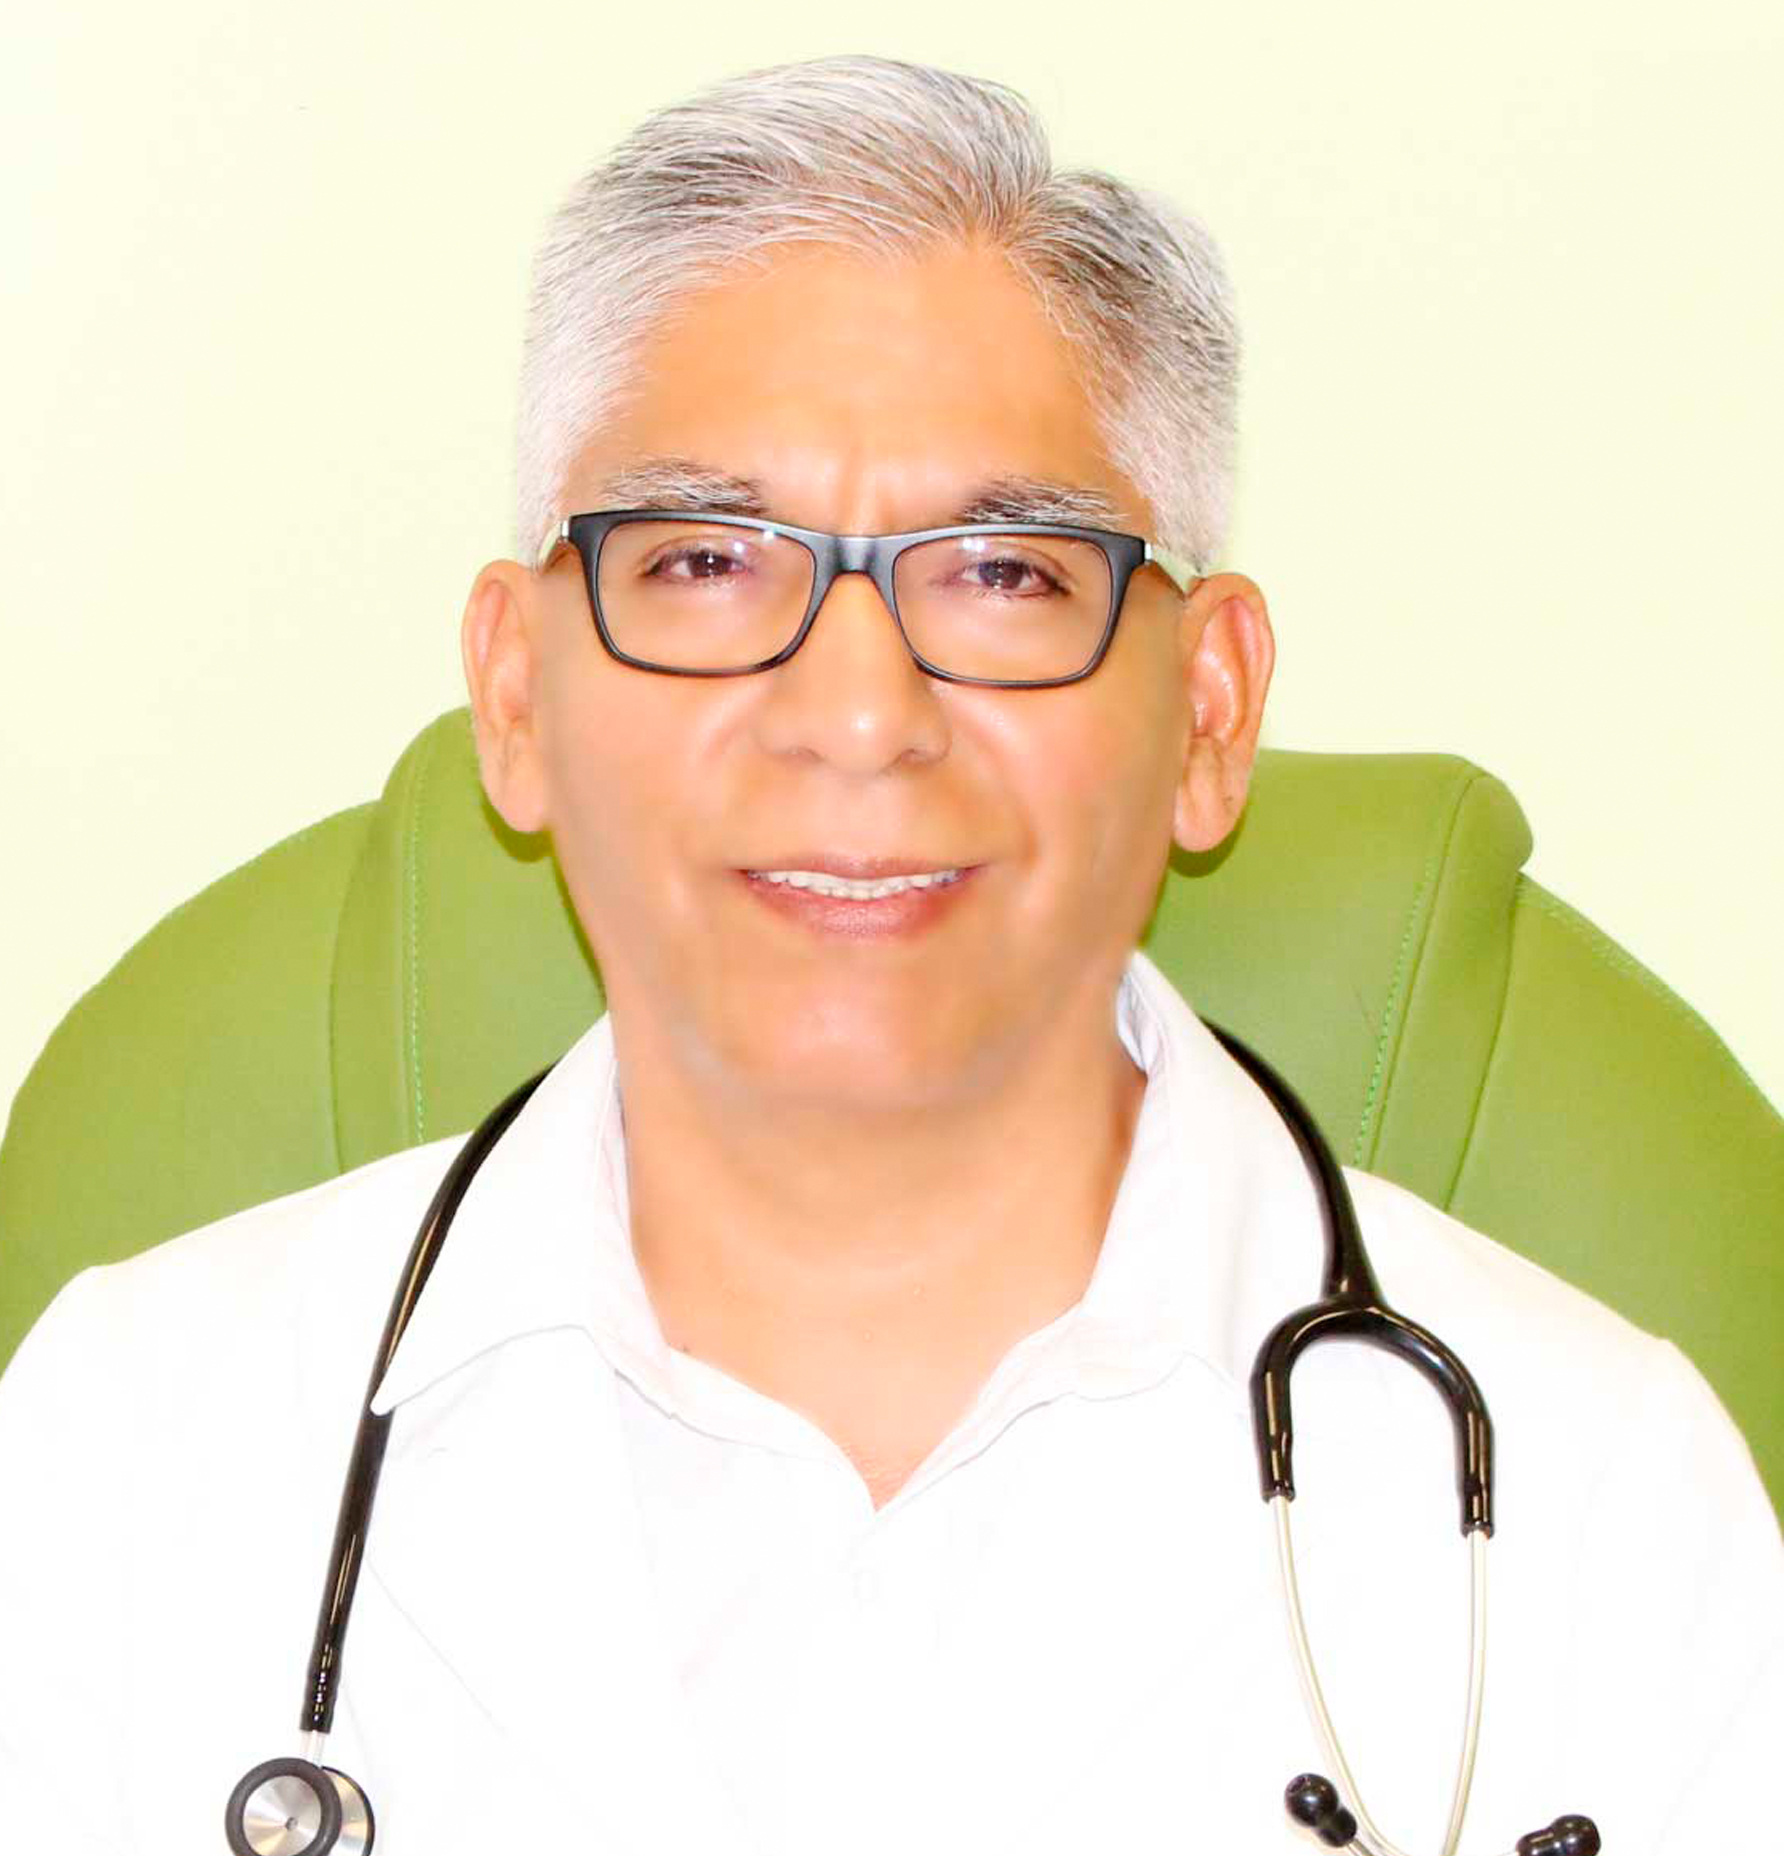 Dr. Ricardo Olea Zapata